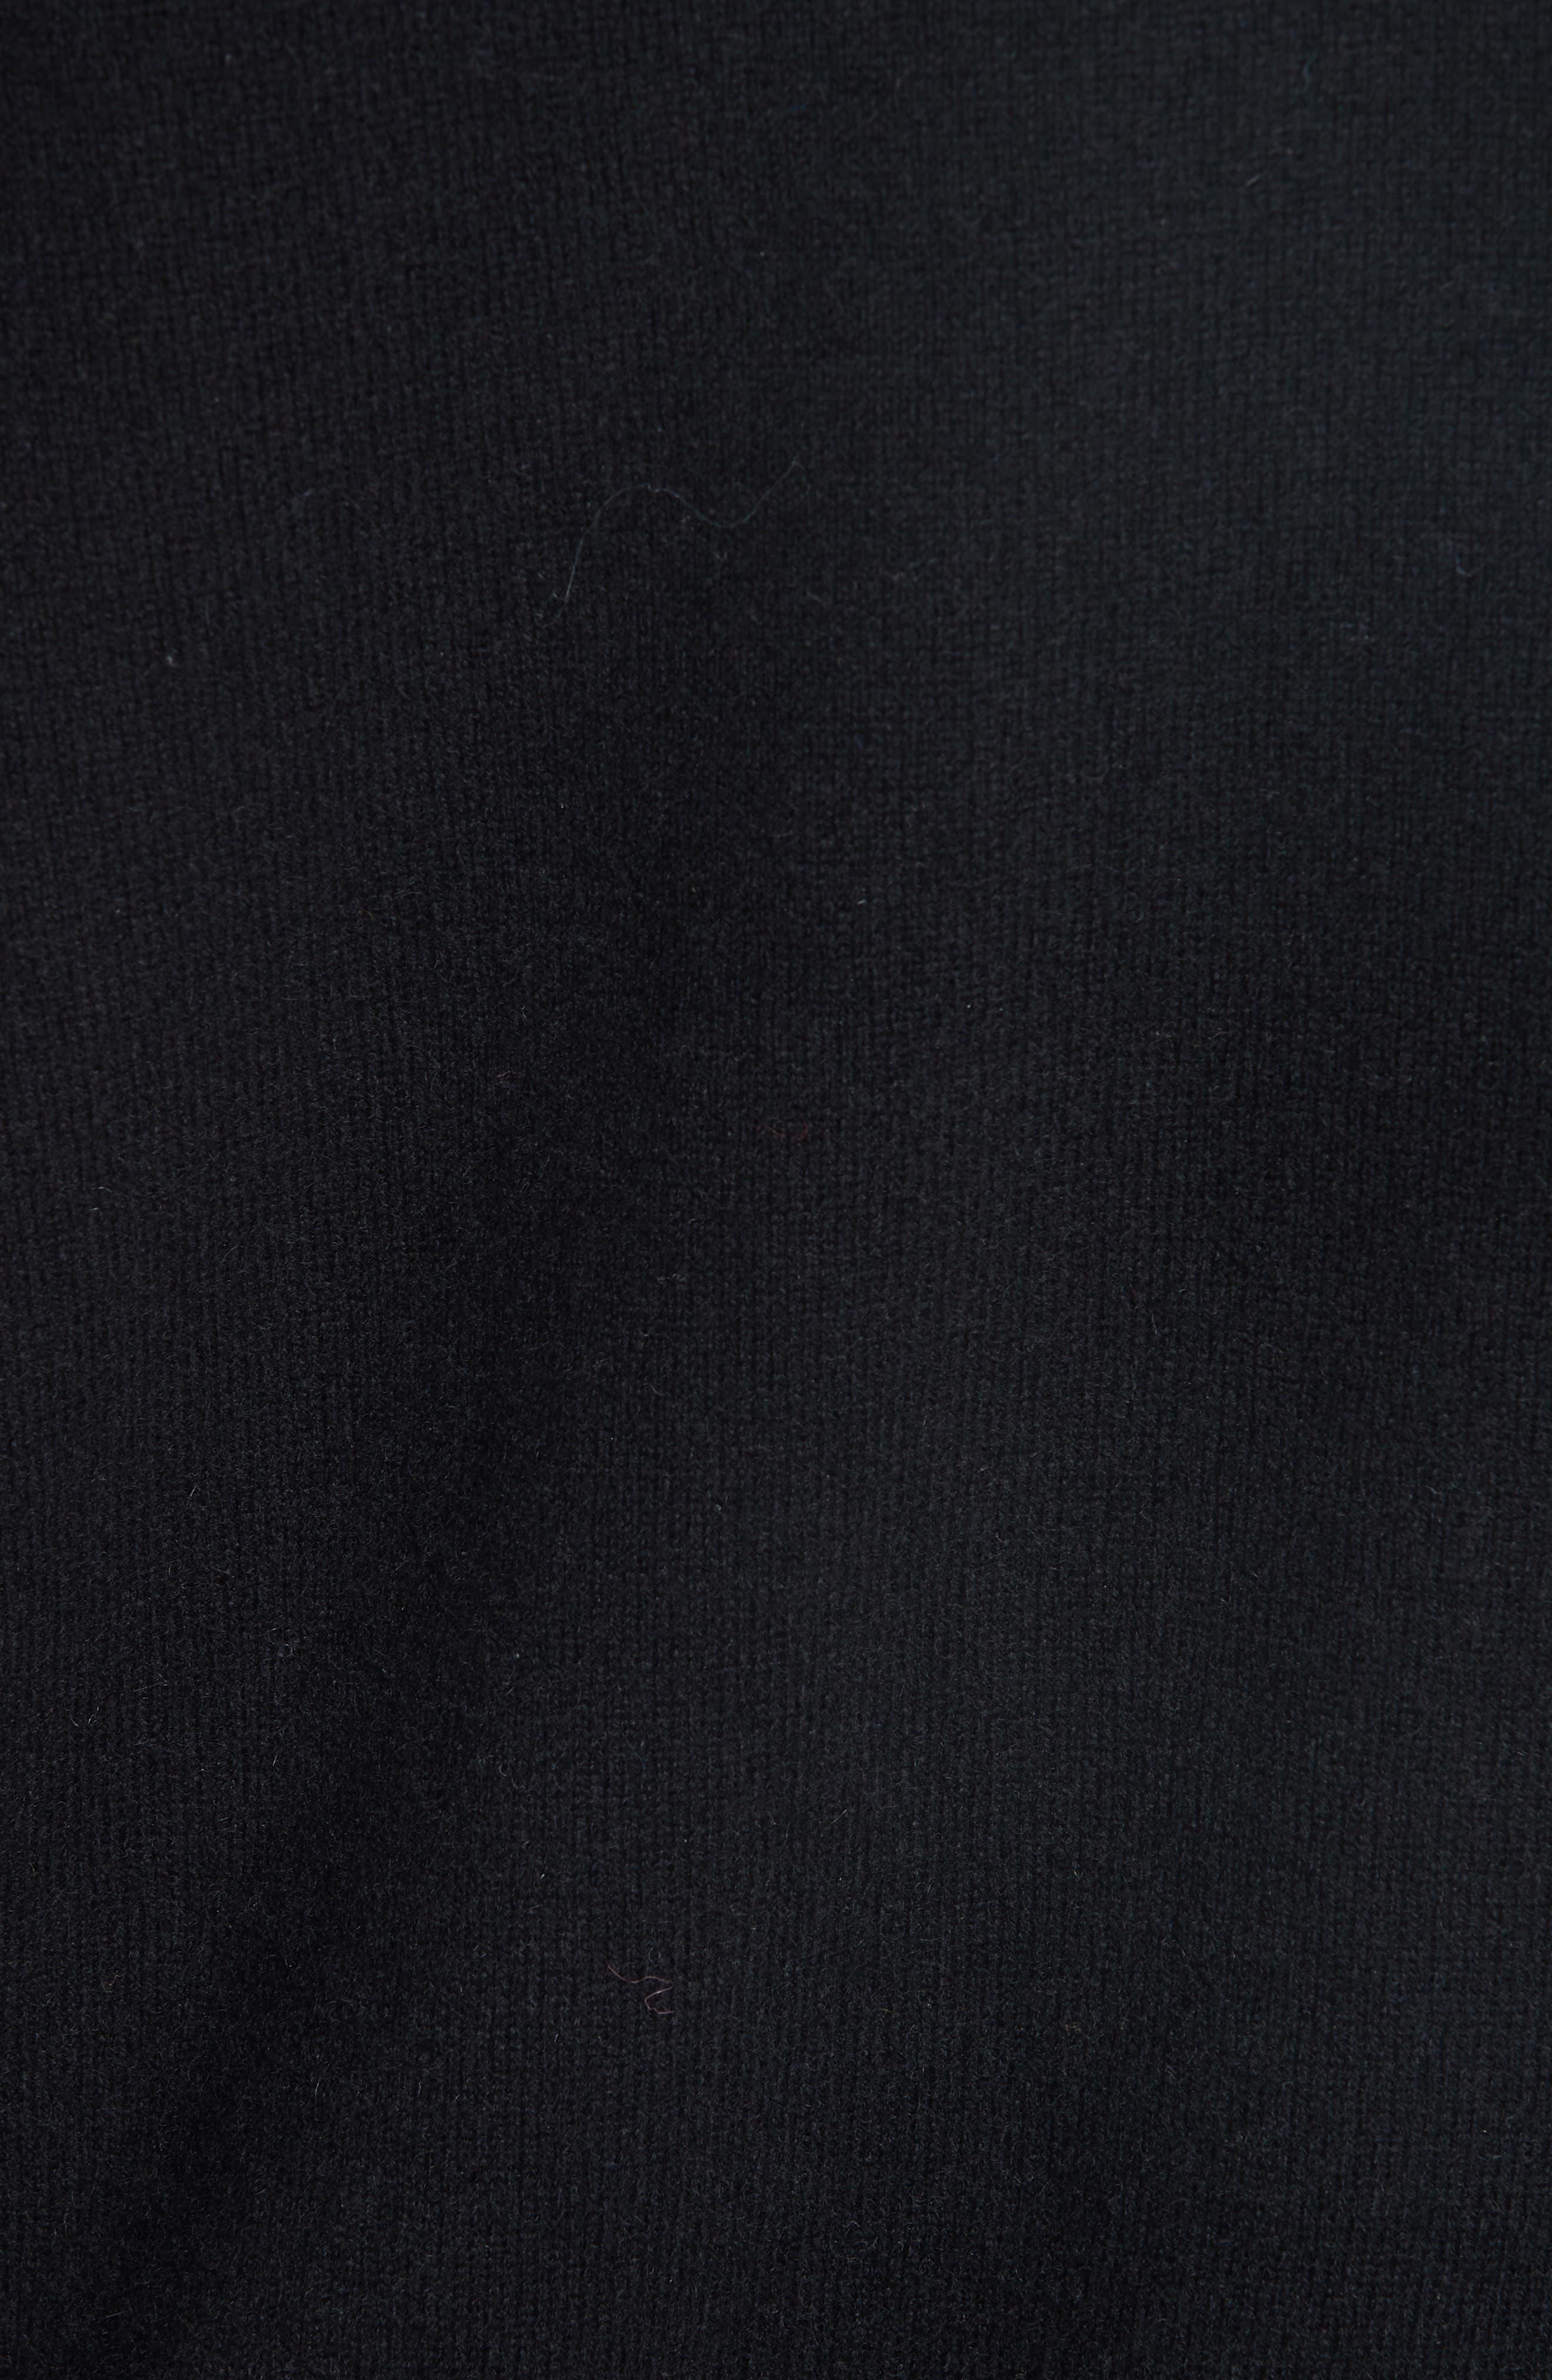 Crewneck Cashmere Sweater,                             Alternate thumbnail 5, color,                             BLACK